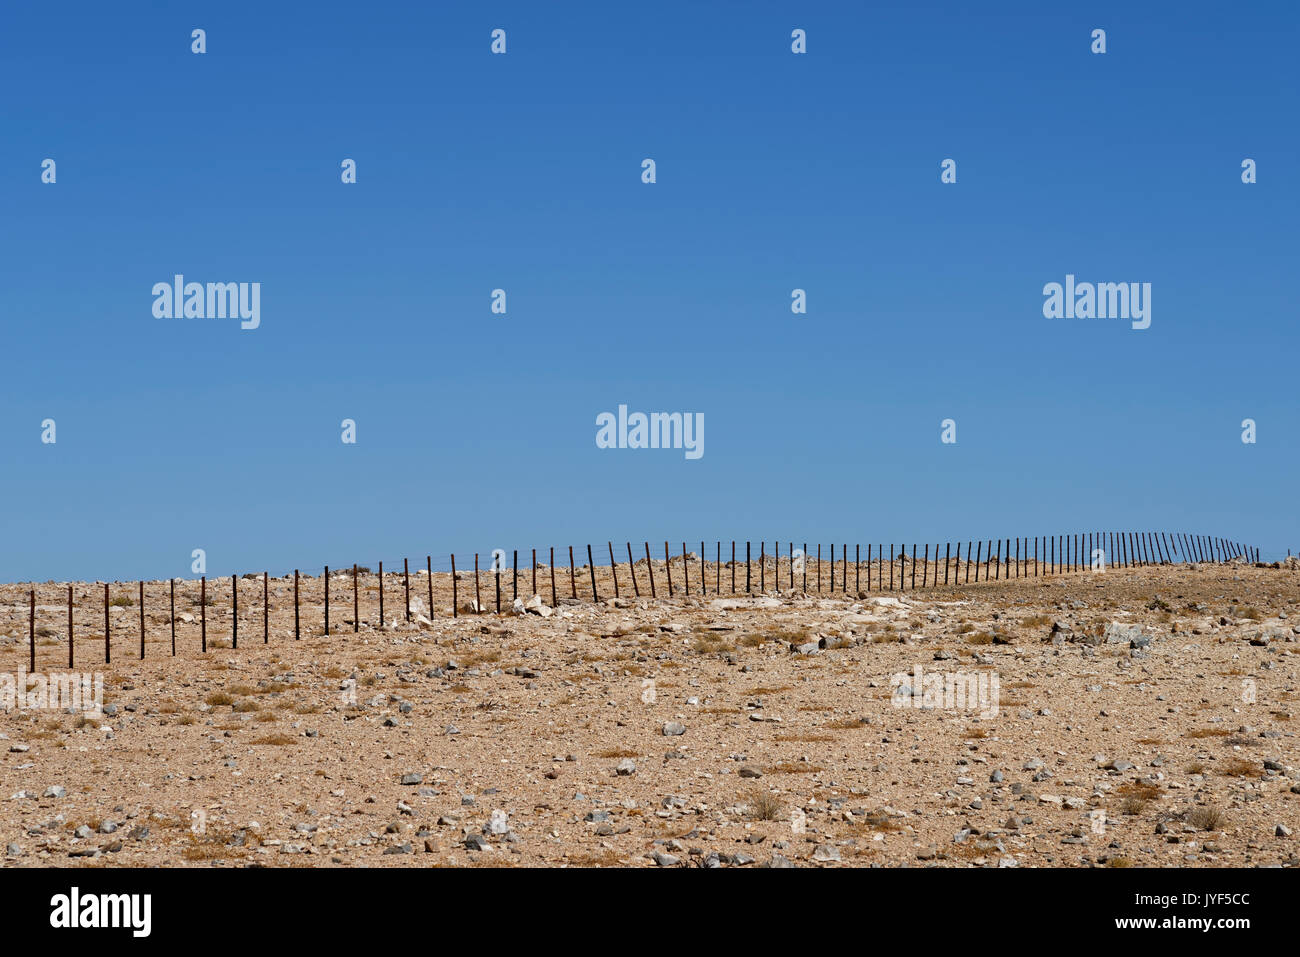 Farm Wüstenquell (Wuestenquell Guest Farm): Farm fence in Namib Desert, Distrikt Karibib, Namibia - Stock Image